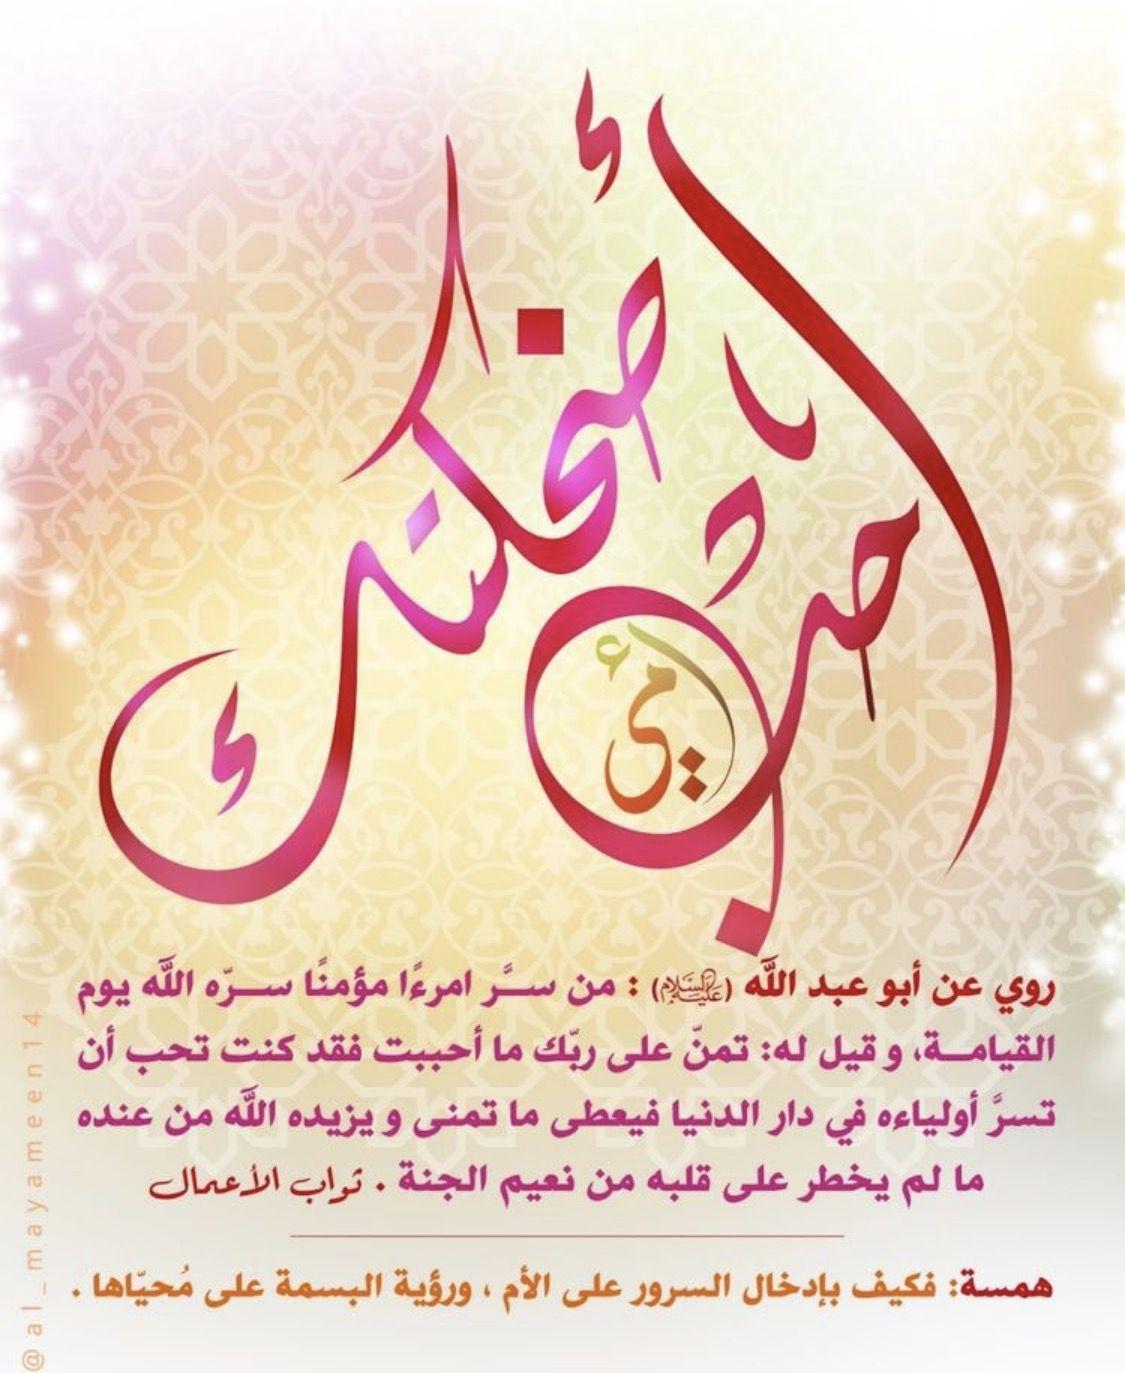 أحب ضحكتك ياأمي Arabic Calligraphy Calligraphy